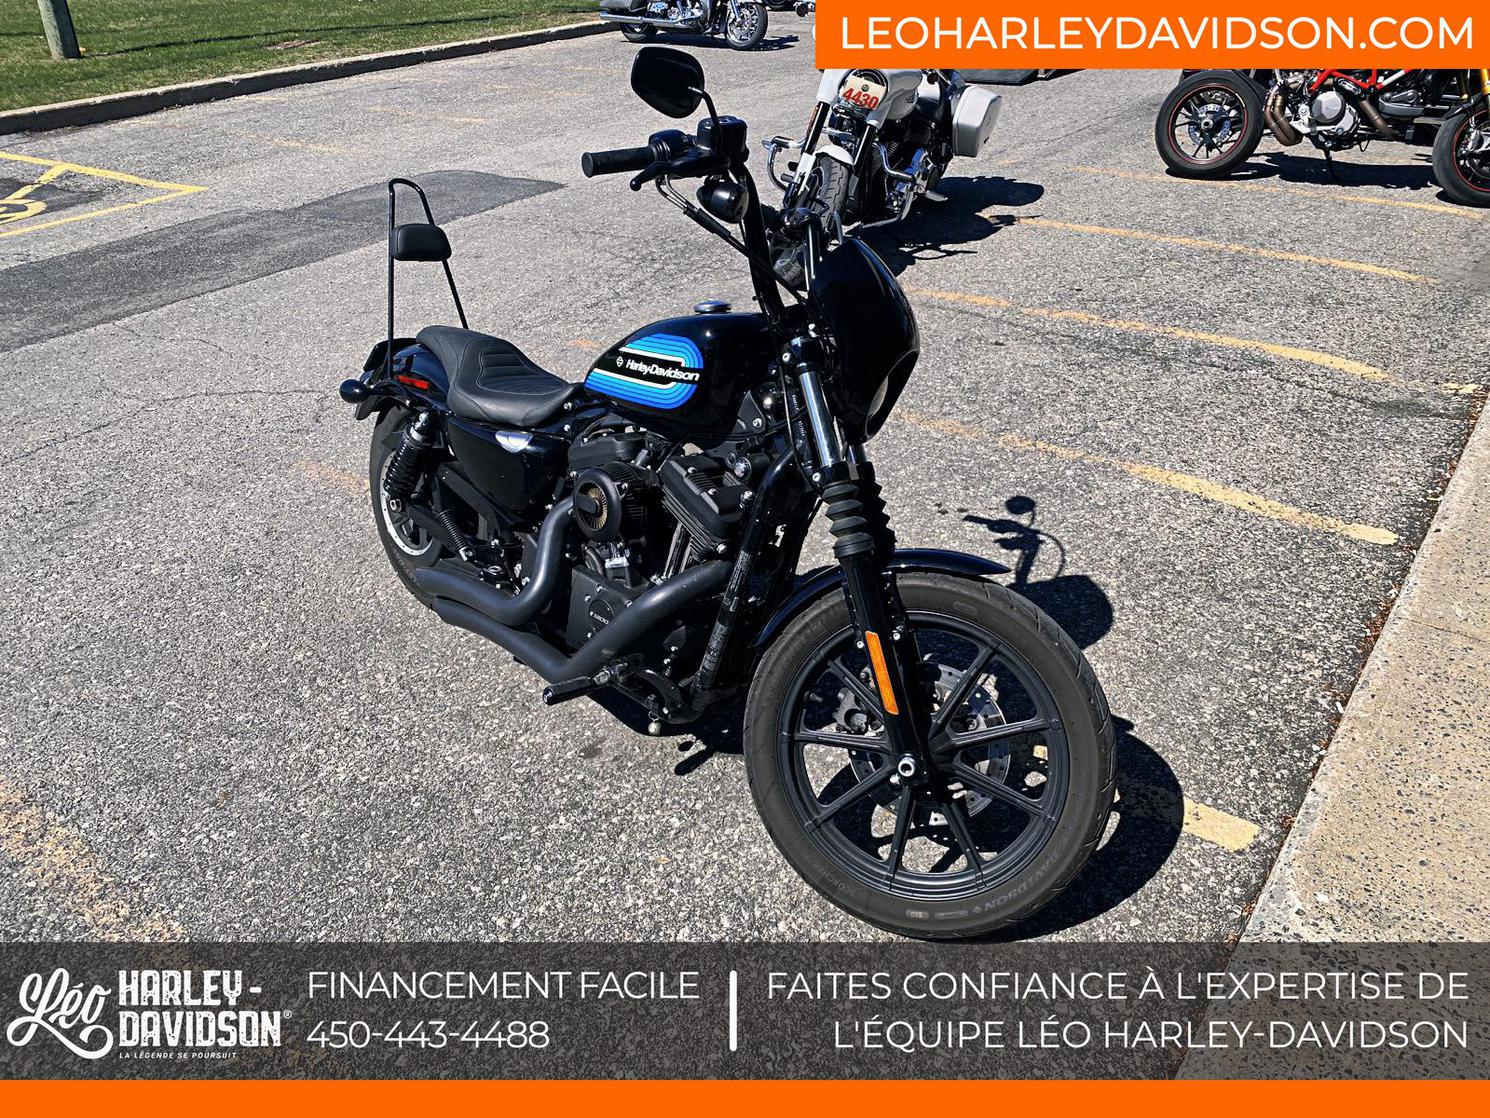 Harley-Davidson sportster iron 1200 2018 - XL1200NS